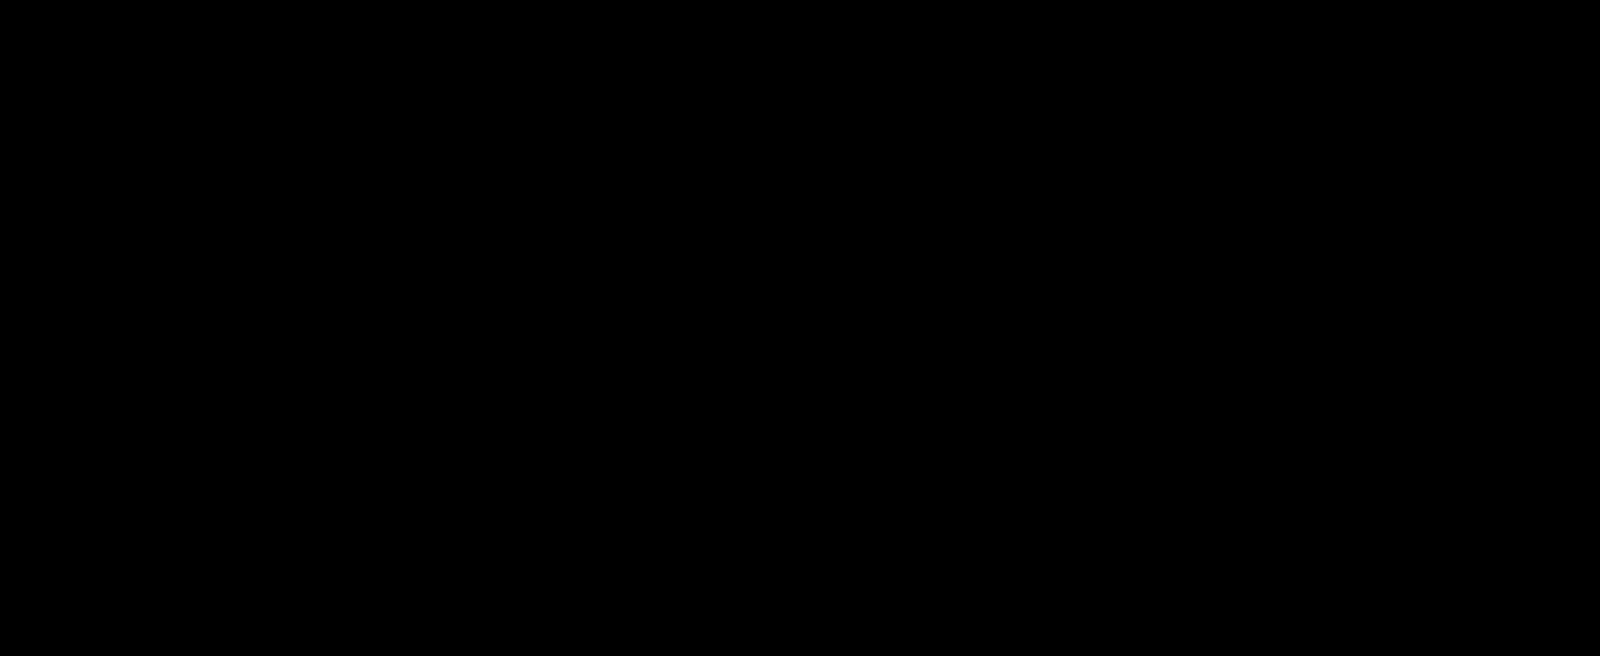 Daewoo Aranos manufacturer logo